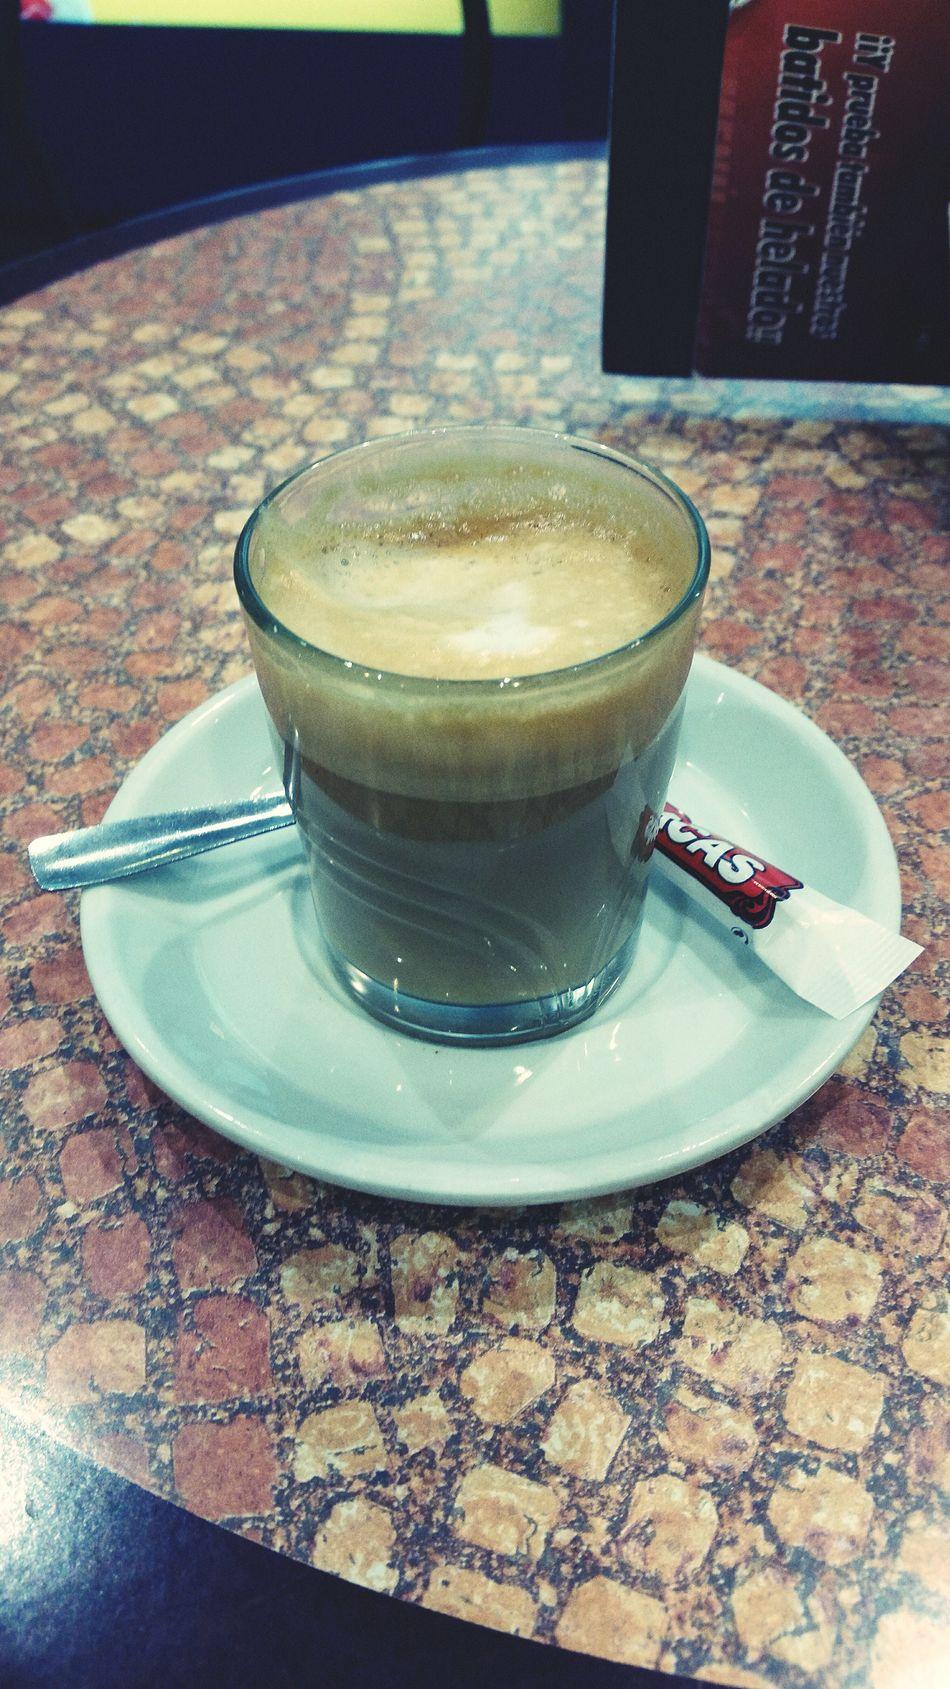 PlaceresDeLaVidaPlaceresveraniegos Cafe Cortado